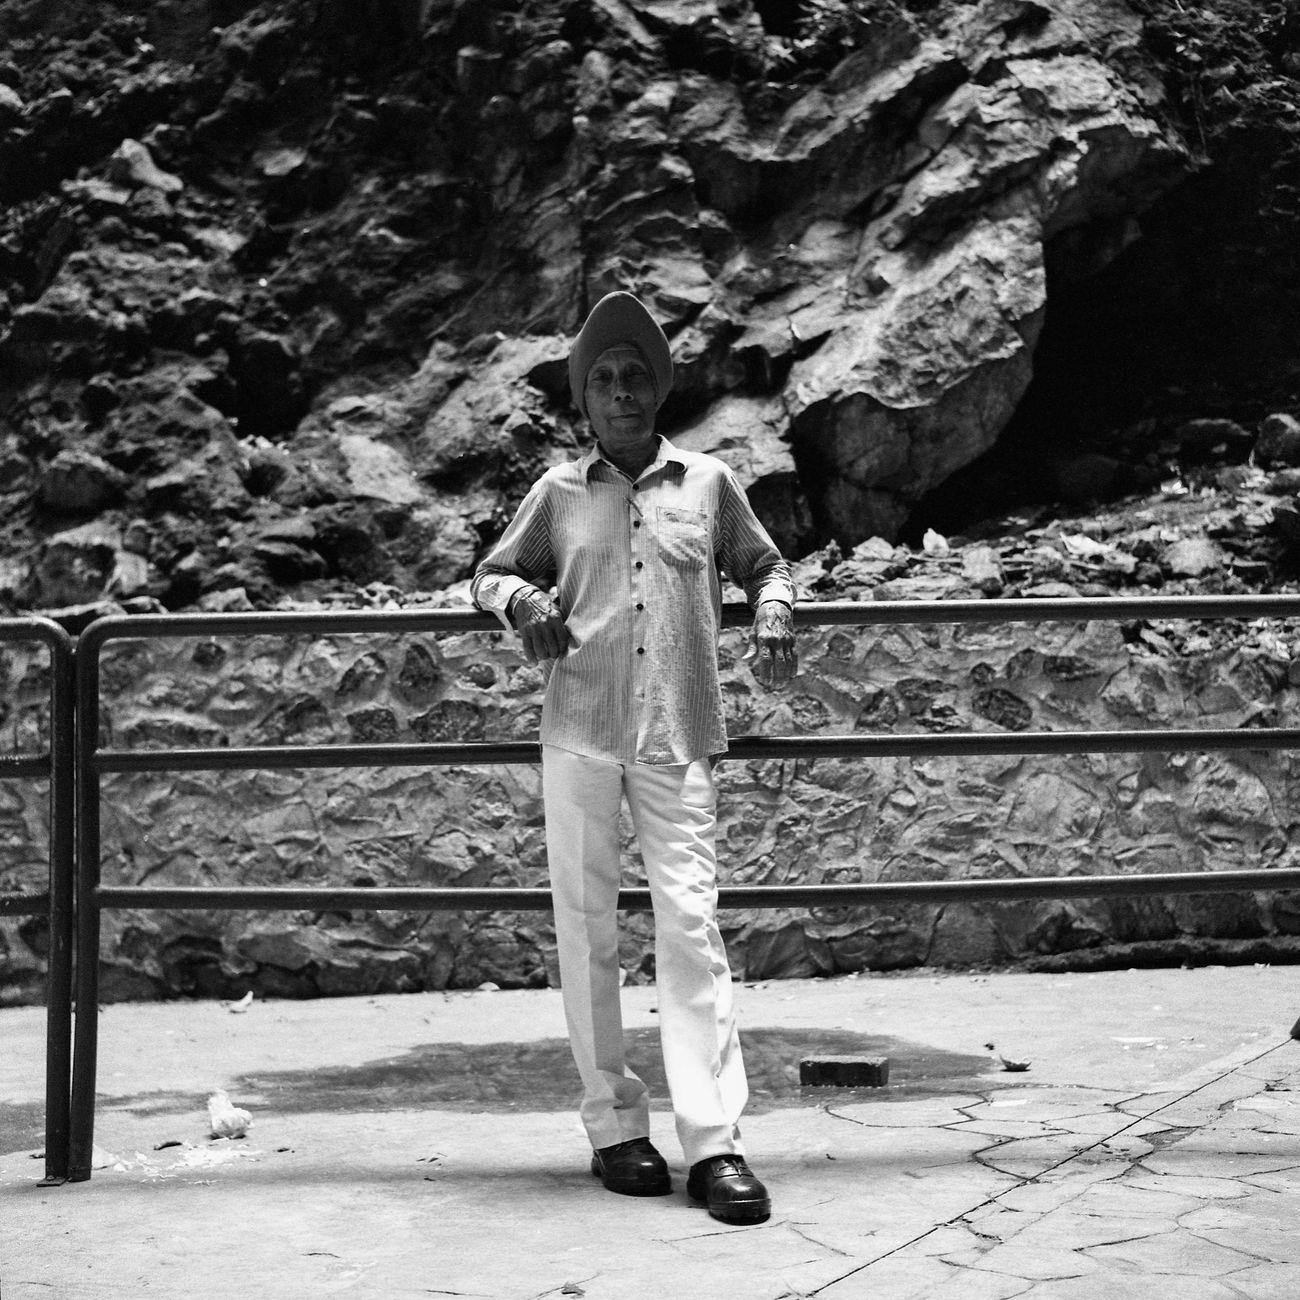 Batu Caves on film 003 Taken with the Rolleiflex Outdoors EyeEmMalaysia People Of EyeEm Black And White Filmisnotdead Rolleiflex Blackandwhite Black And White Photography Filmphotography Believeinfilm Streetphotography Street Photography Streetphoto_bw Thaipusam Thaipusam 2017 Ishootfilm People Real People